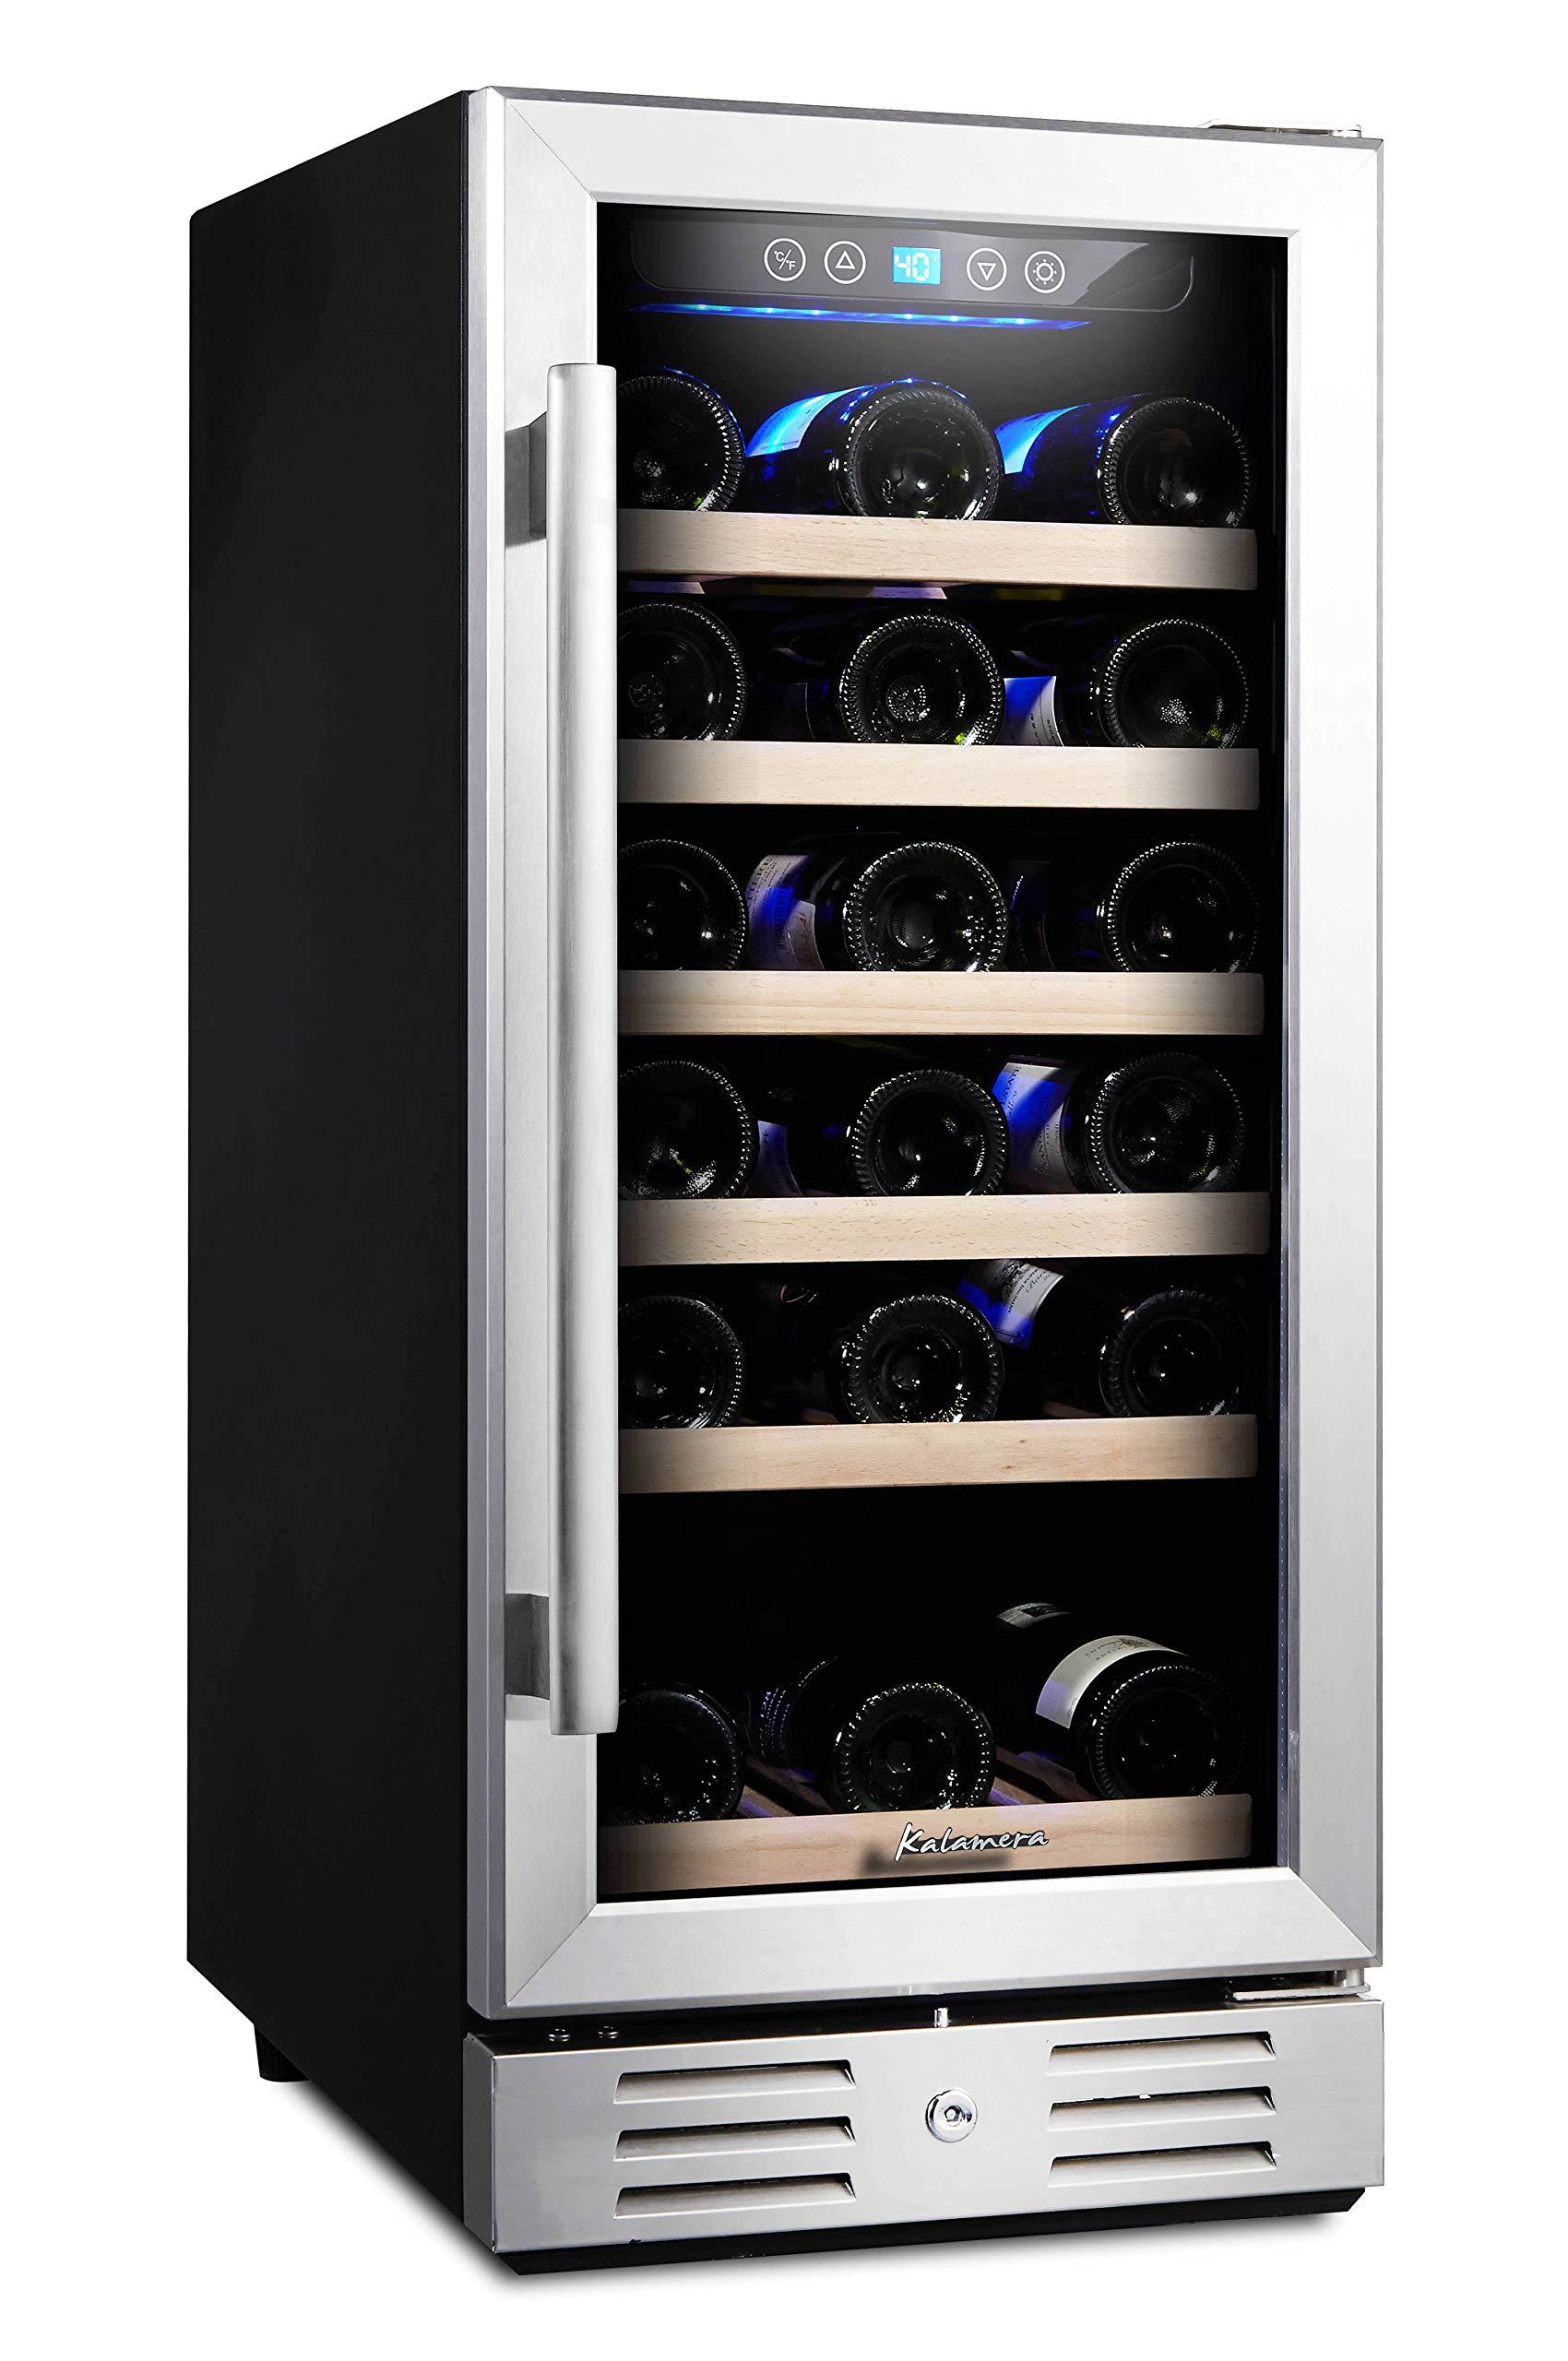 Uline wine cooler leaking water